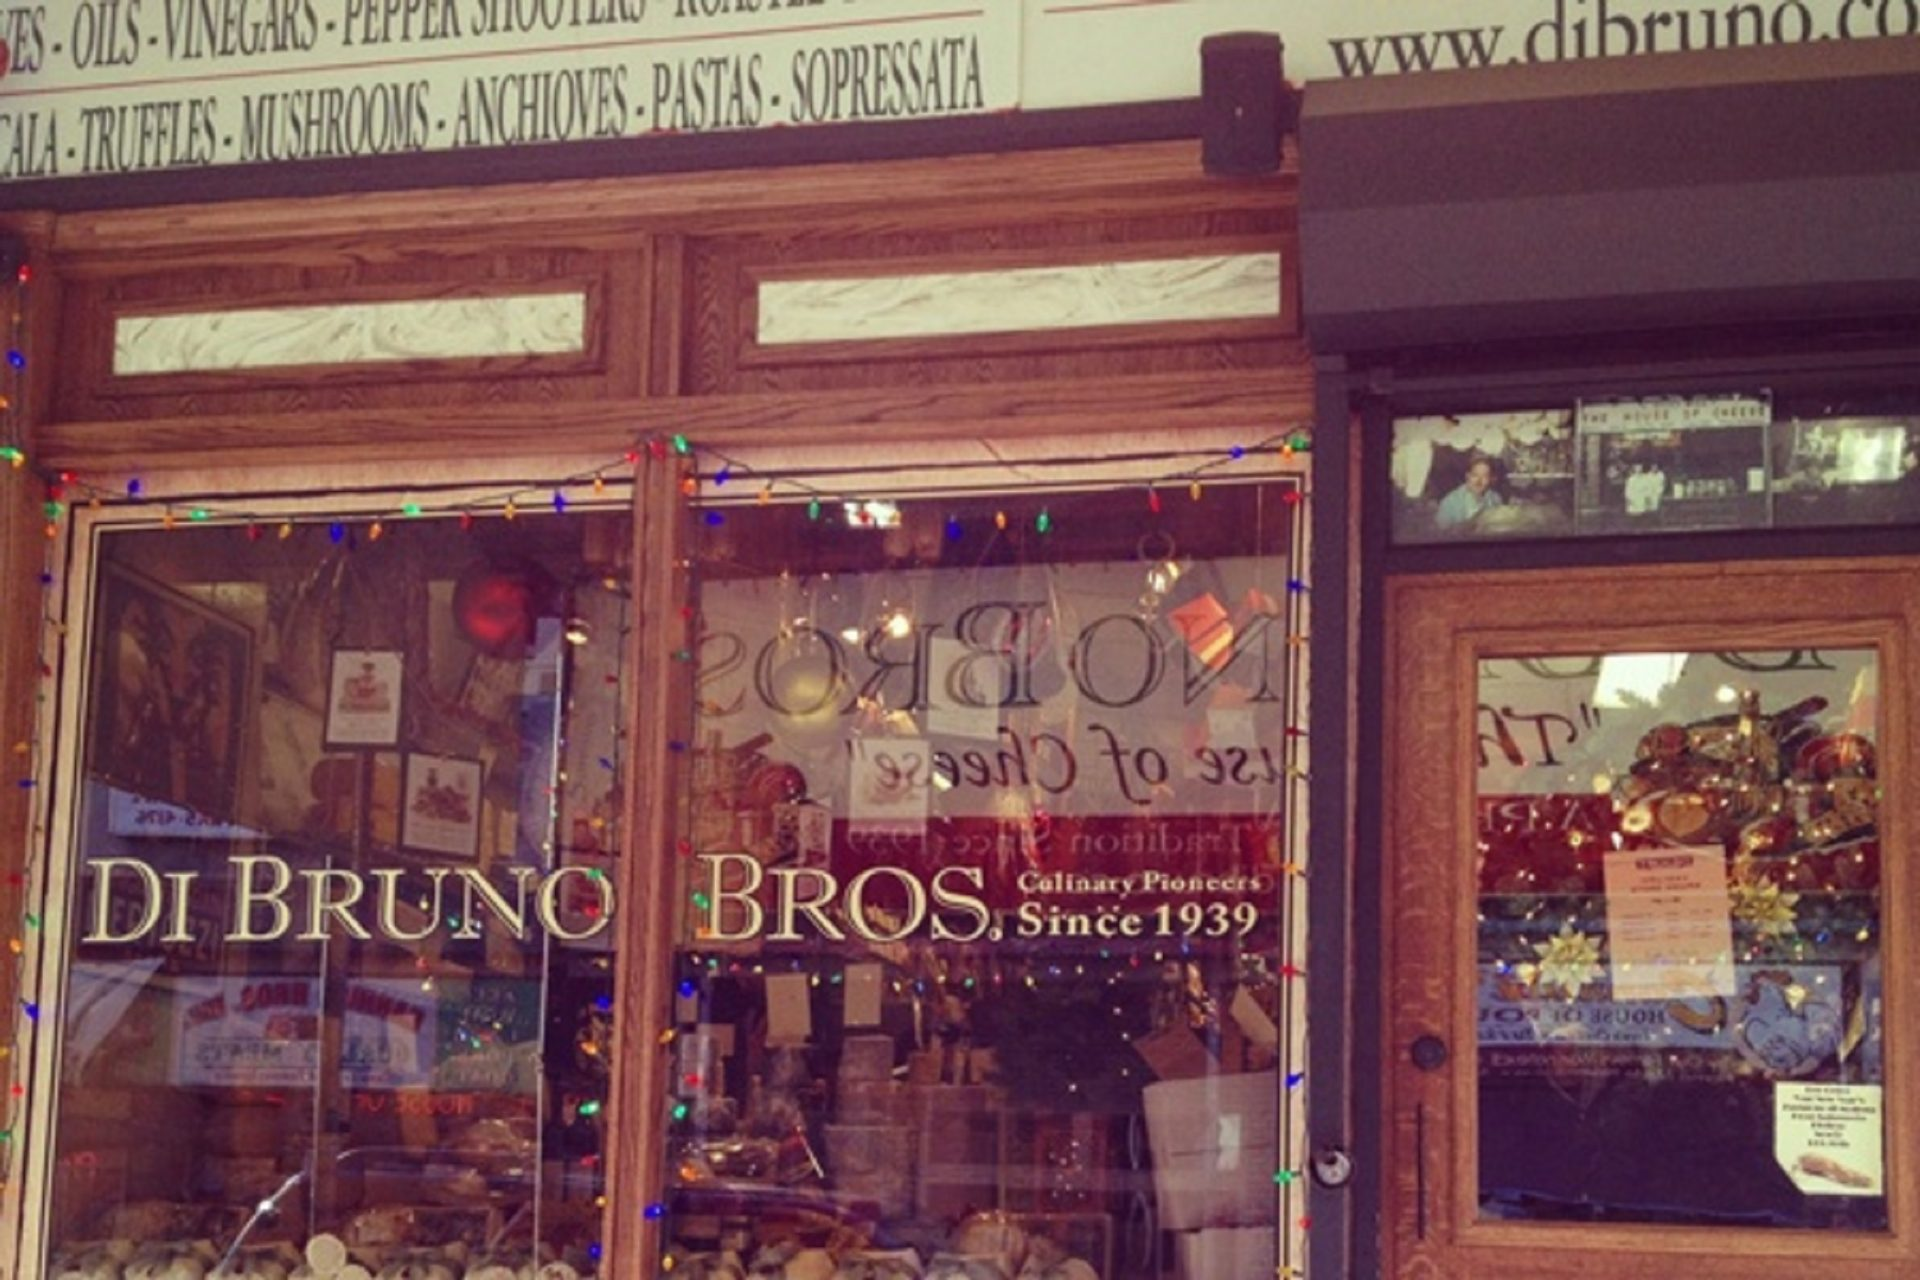 DiBruno Bros